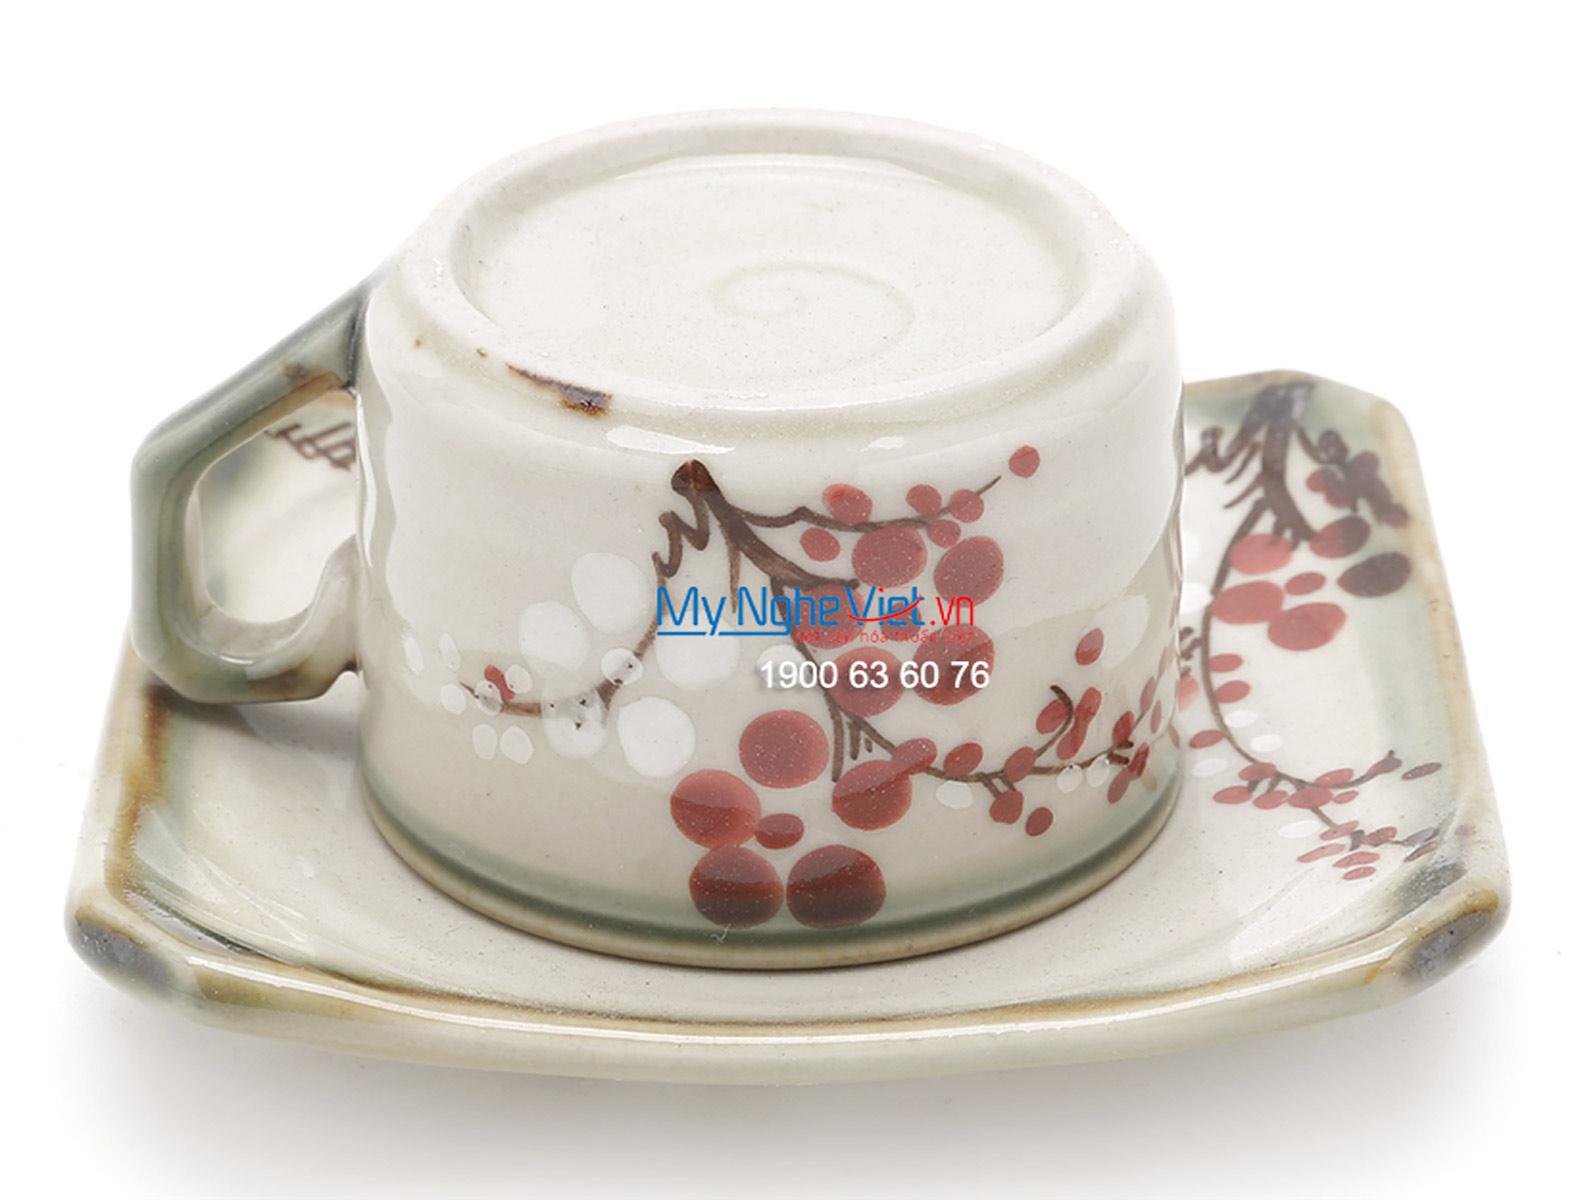 Bat Trang Tea Set with Glossy Square Glaze, Peach Blossom Pattern, and Aluminium Strap MNV-BT256